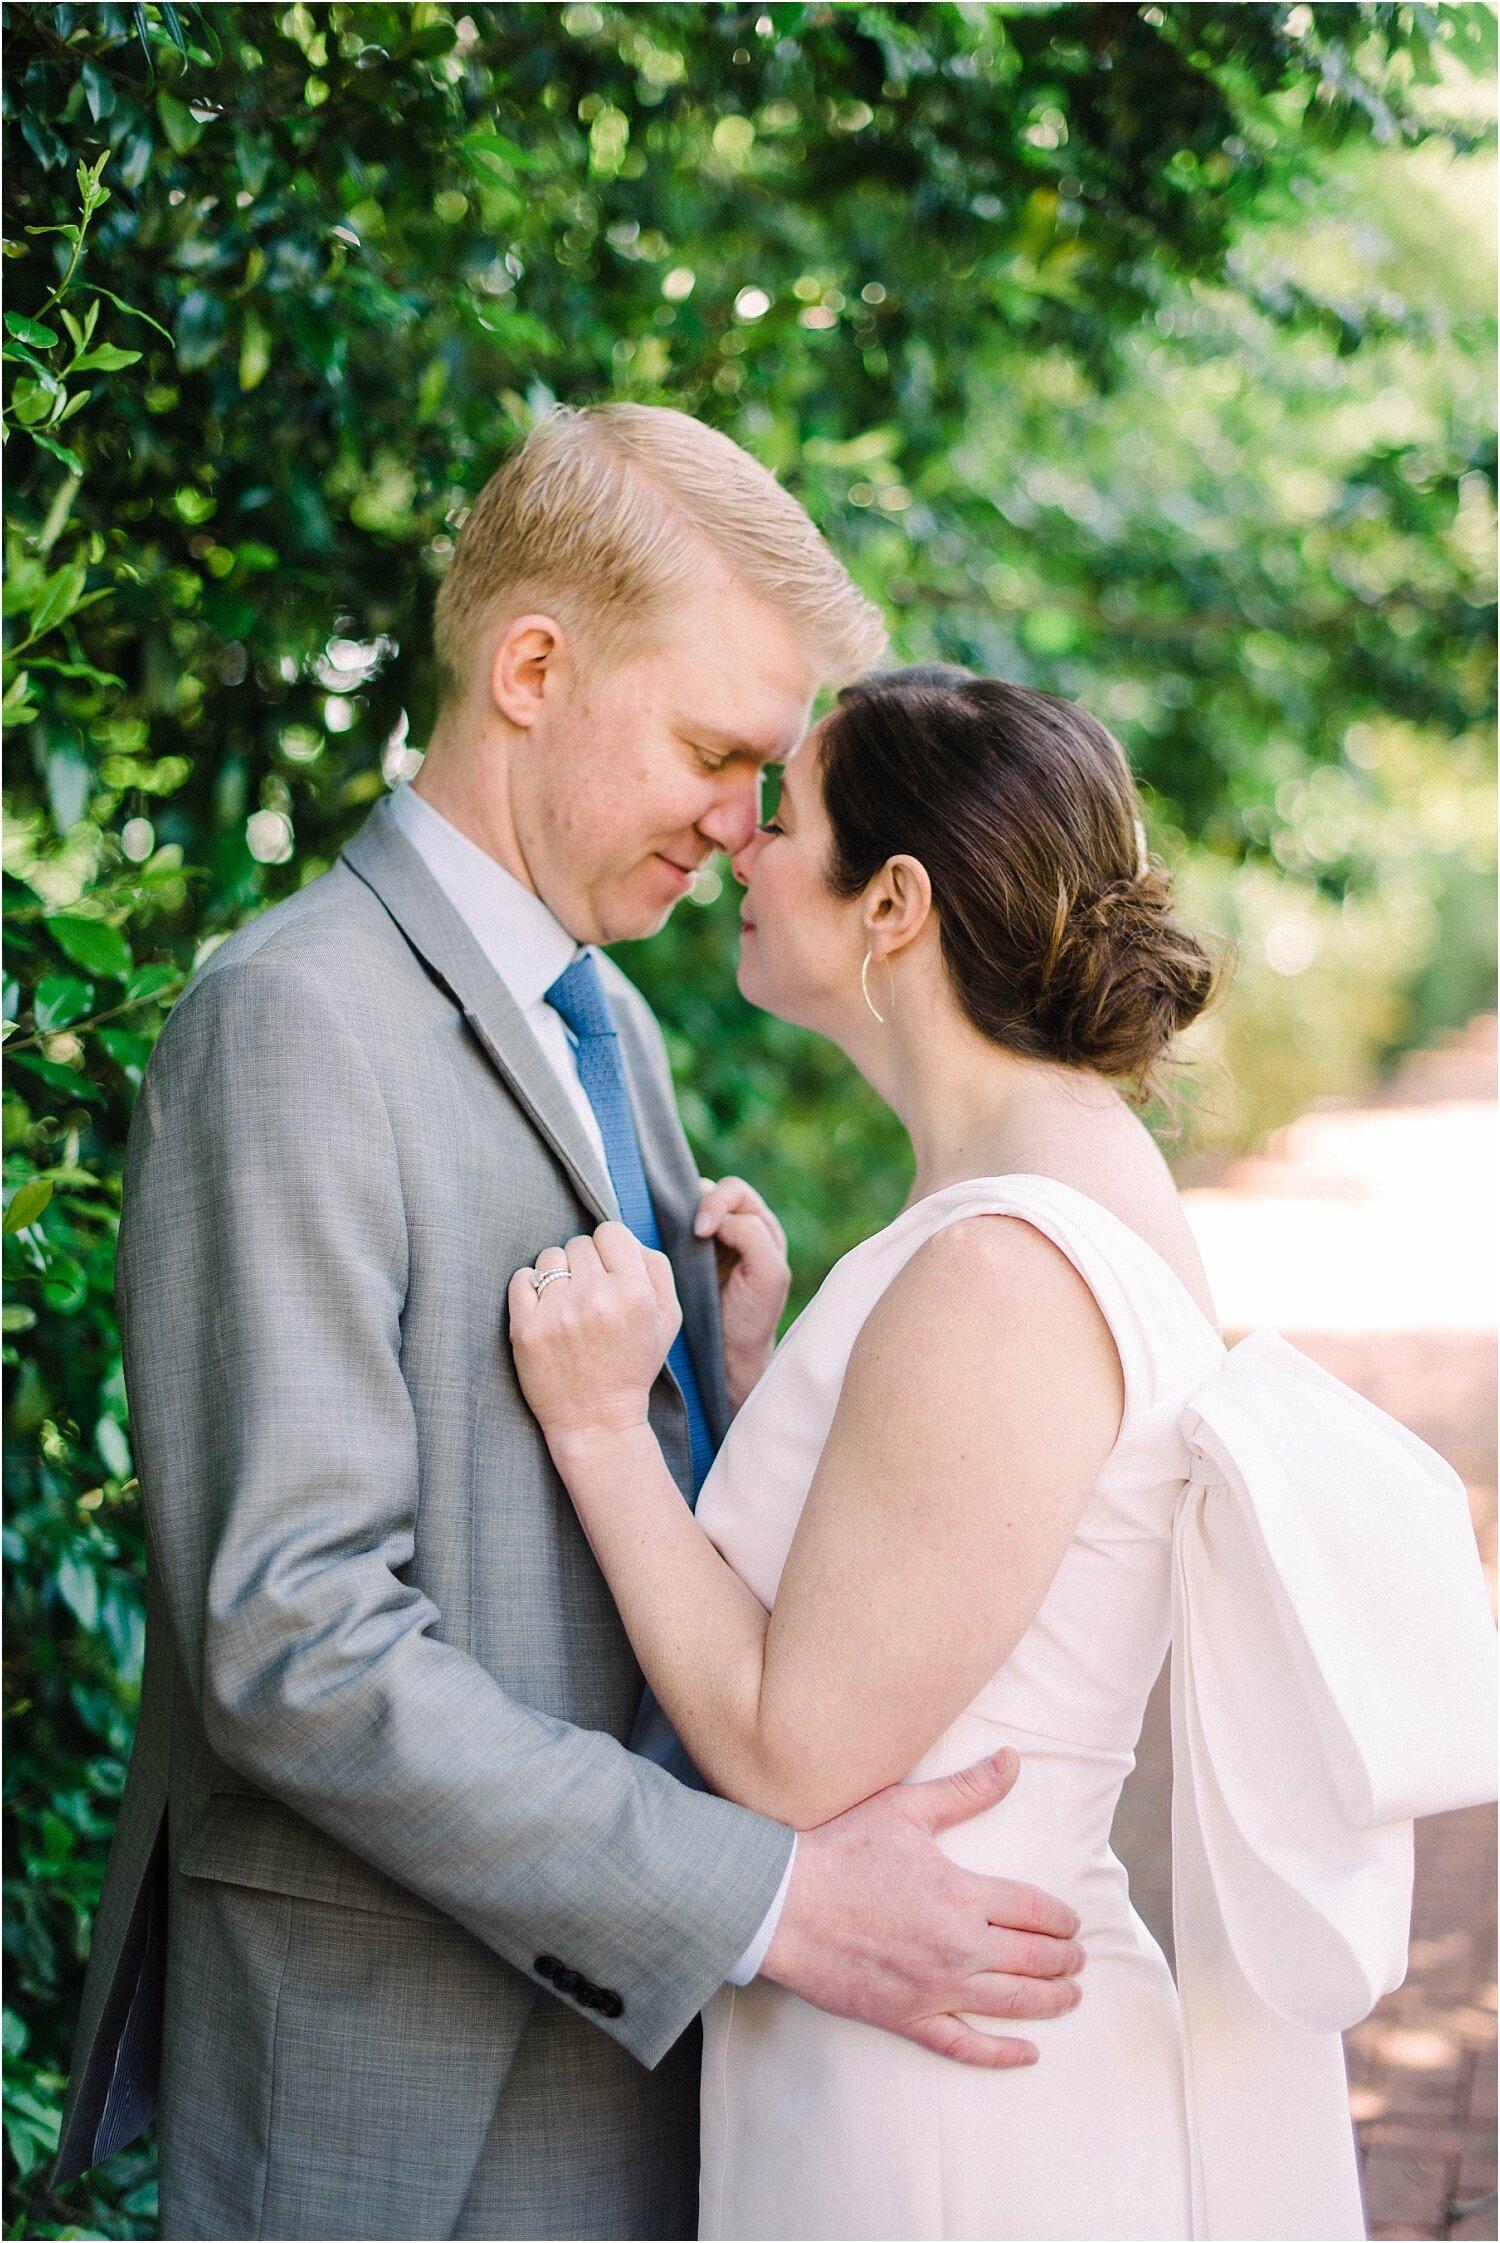 Heather + Scott-Longue-Vue-house-and-gardens-black-tie-wedding-photos_Gabby Chapin_Print_0120_BLOG.jpg